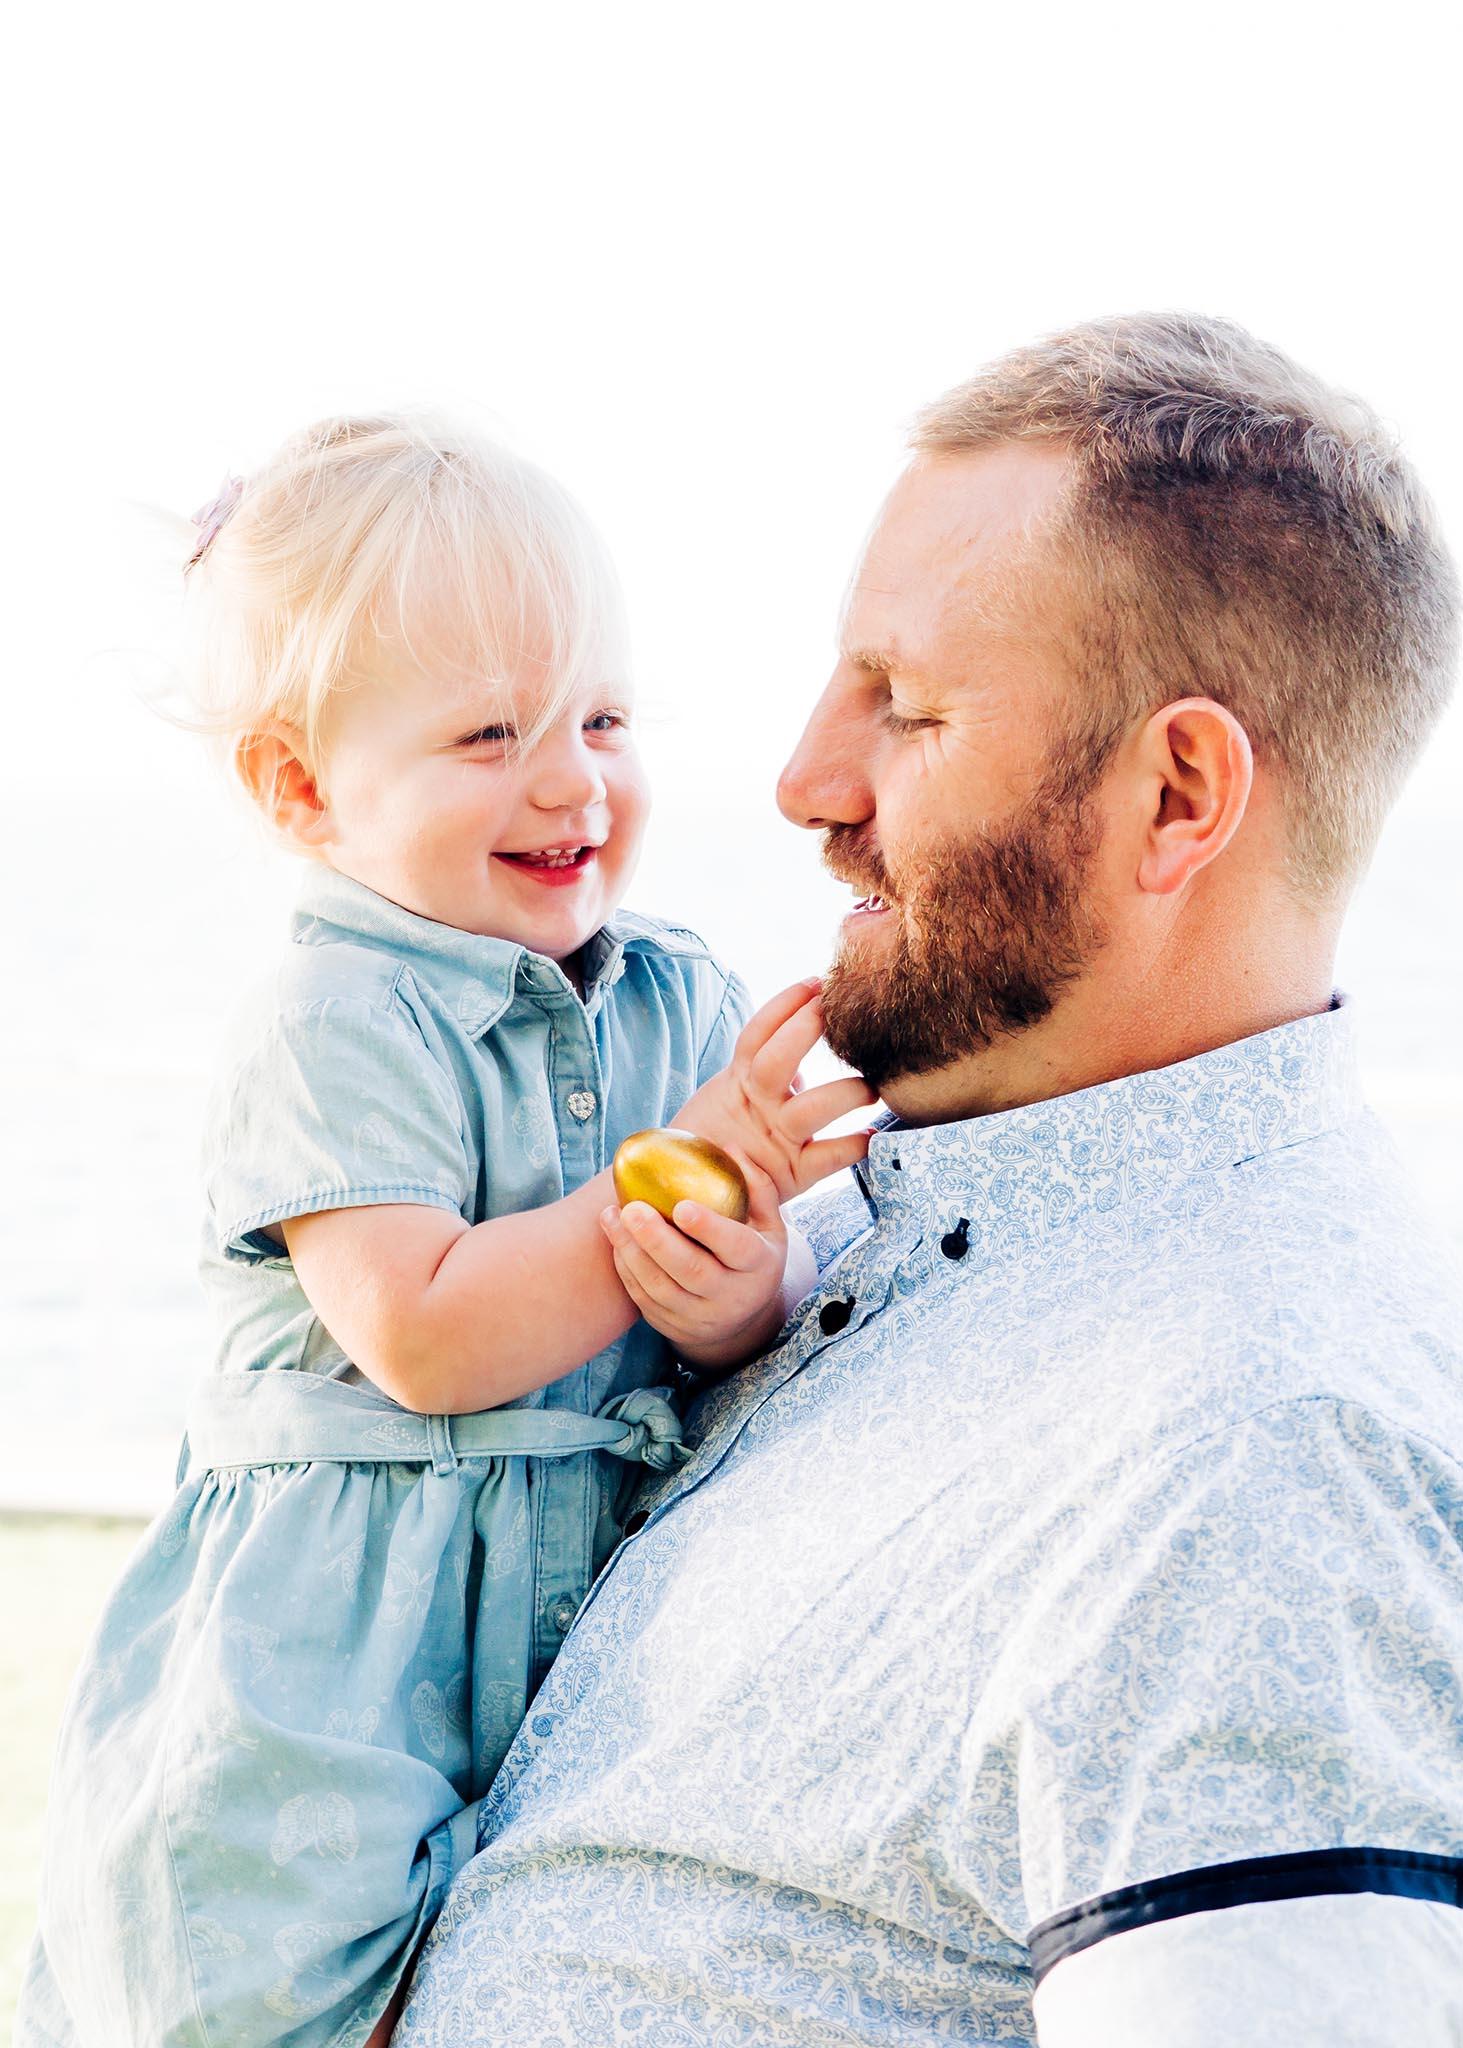 family-photographer-dad-bub-kids.jpg